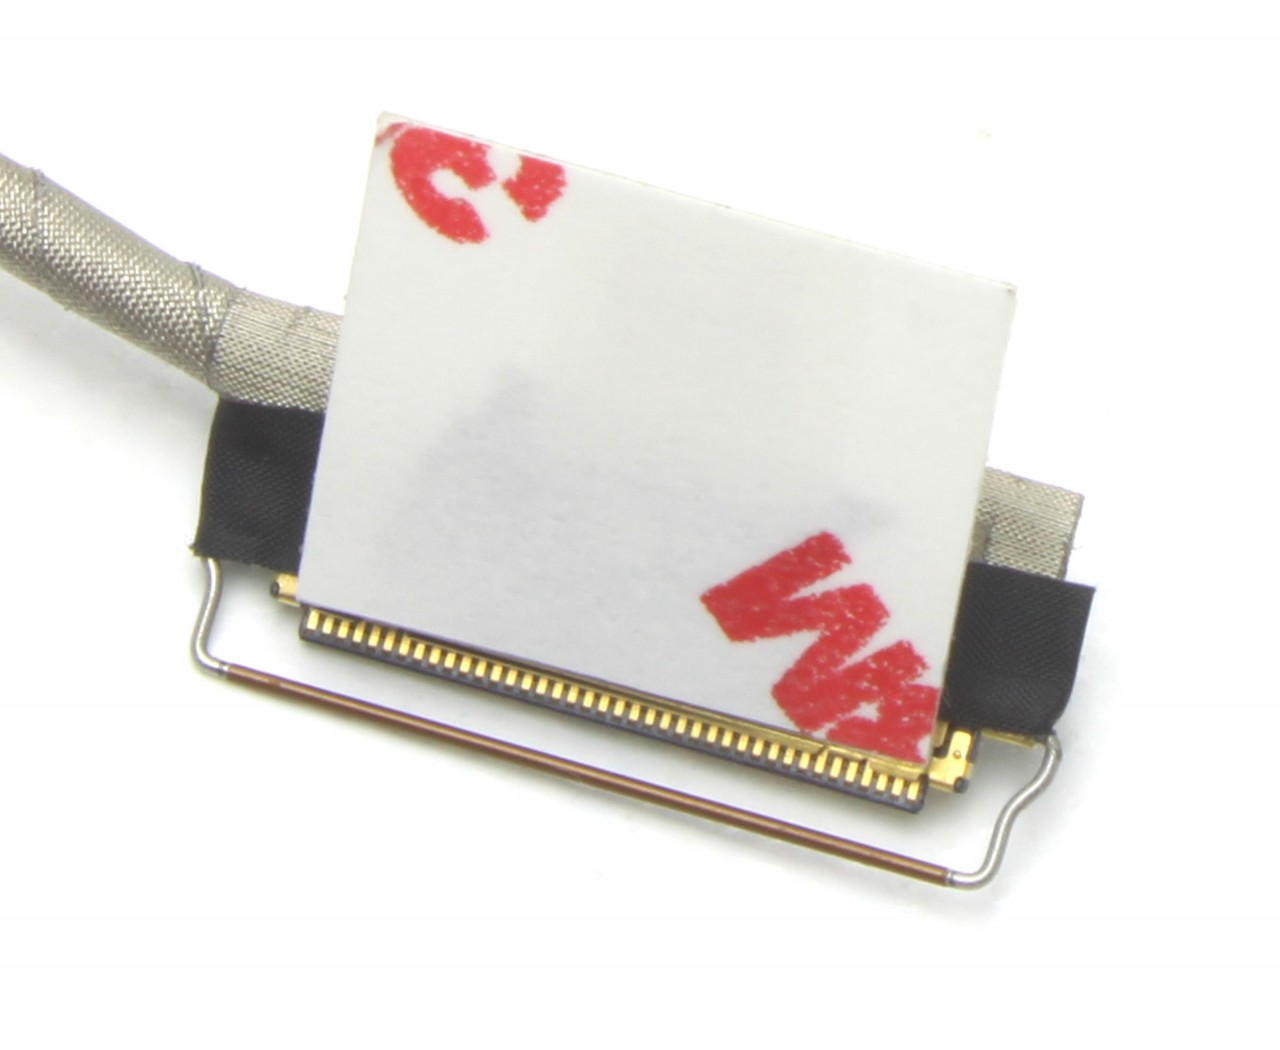 Cablu video eDP Dell Inspiron 15 5558 40 pini FULL HD 1920x1080 cu touchscreen imagine powerlaptop.ro 2021